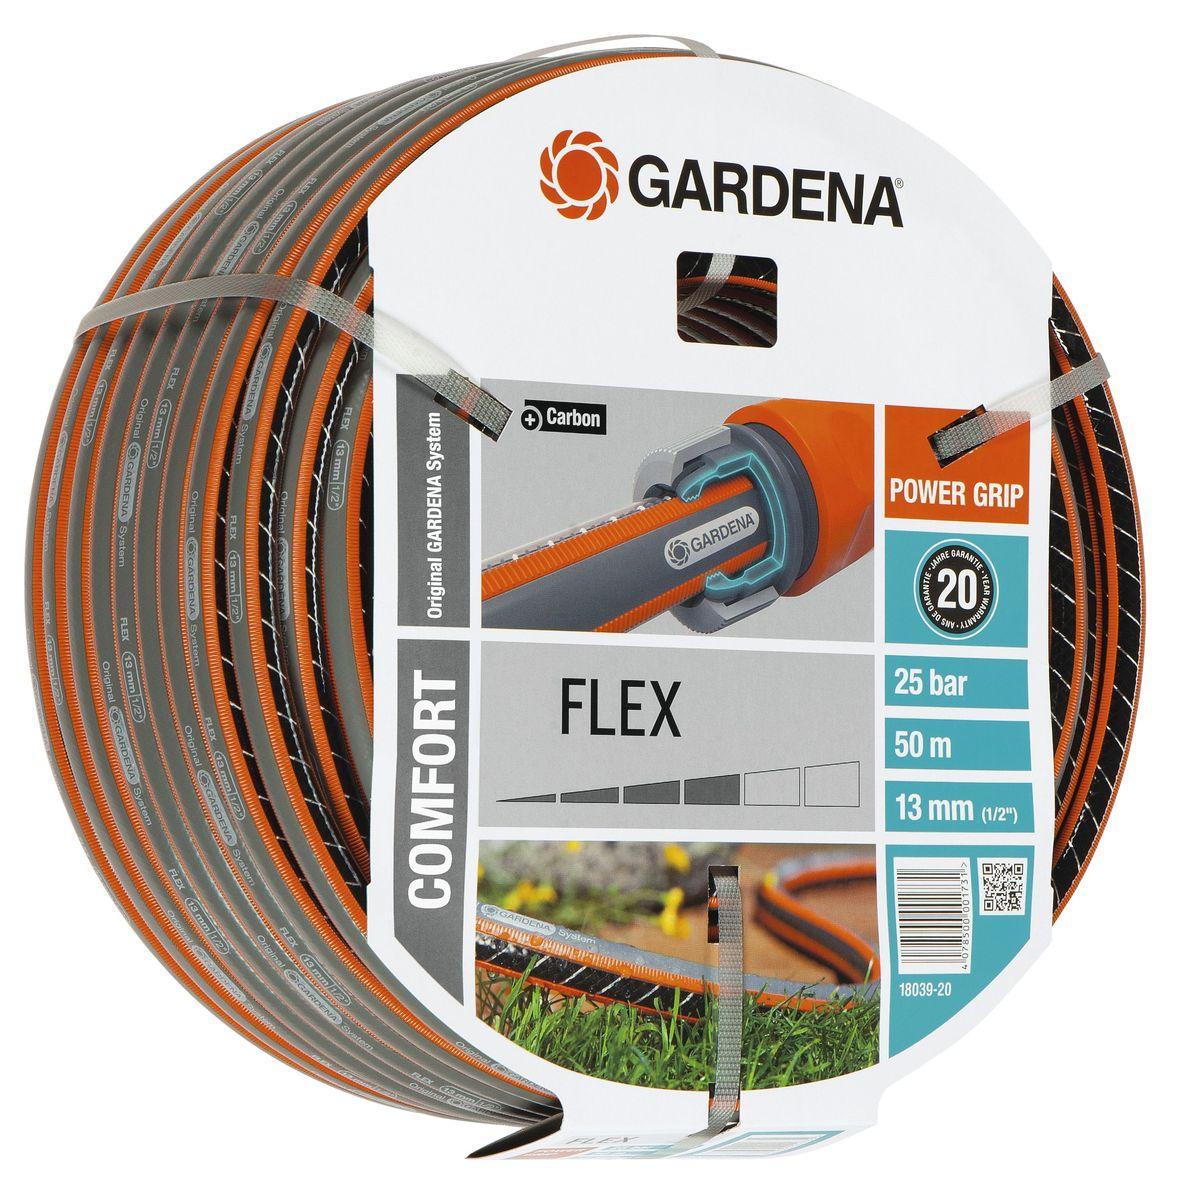 Шланг Gardena Flex, диаметр 1/2, длина 50 м шланг подающий gardena 25 мм х 25 м 02792 20